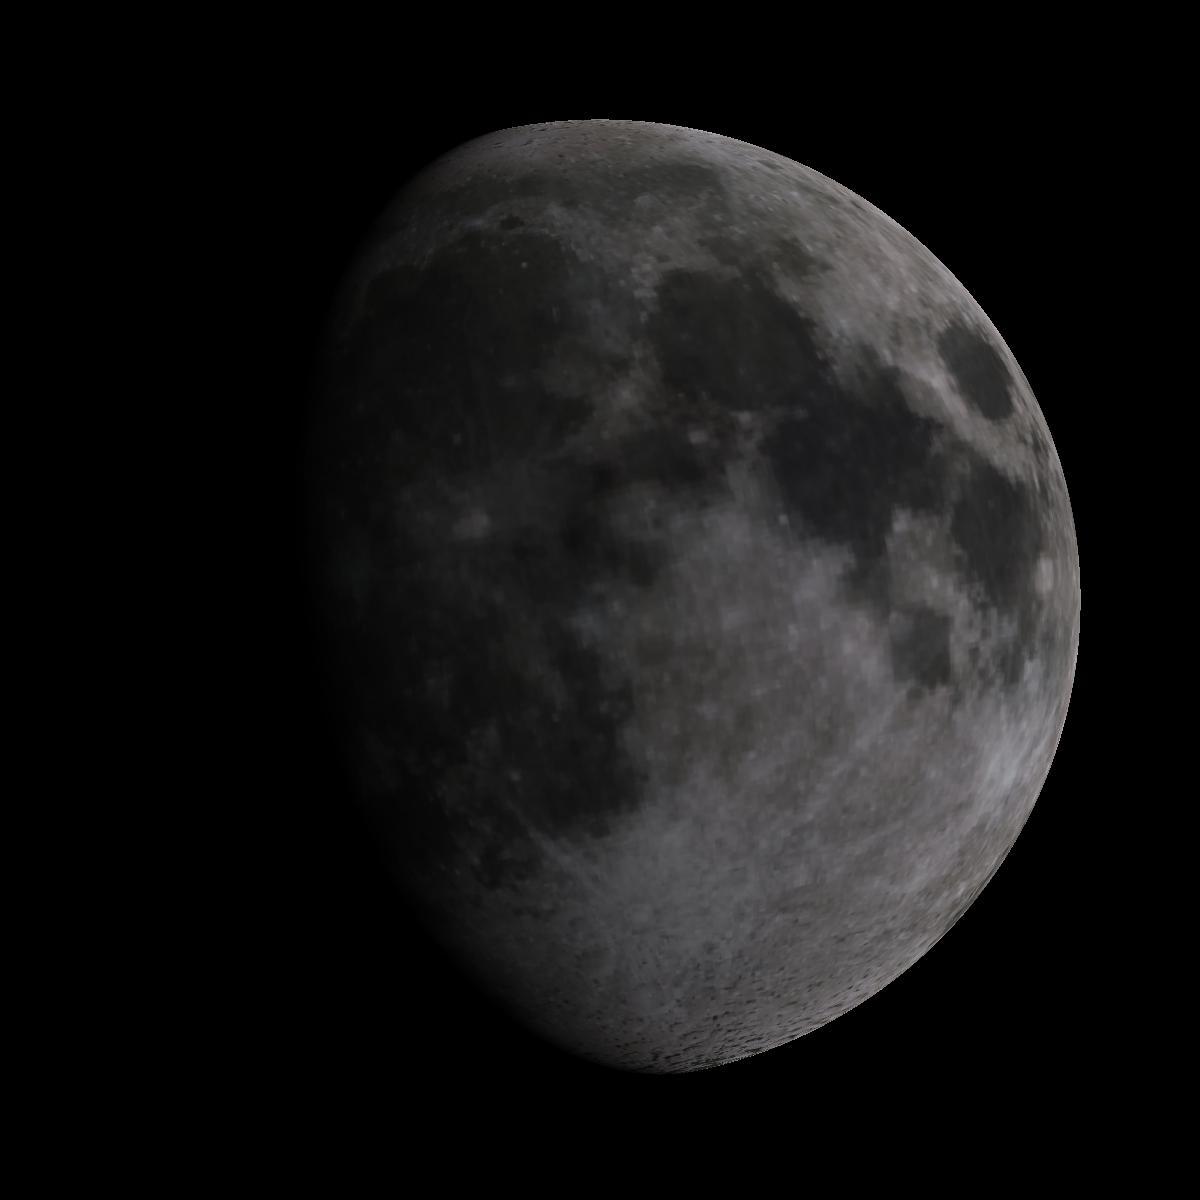 Lune du 6 mars 2020